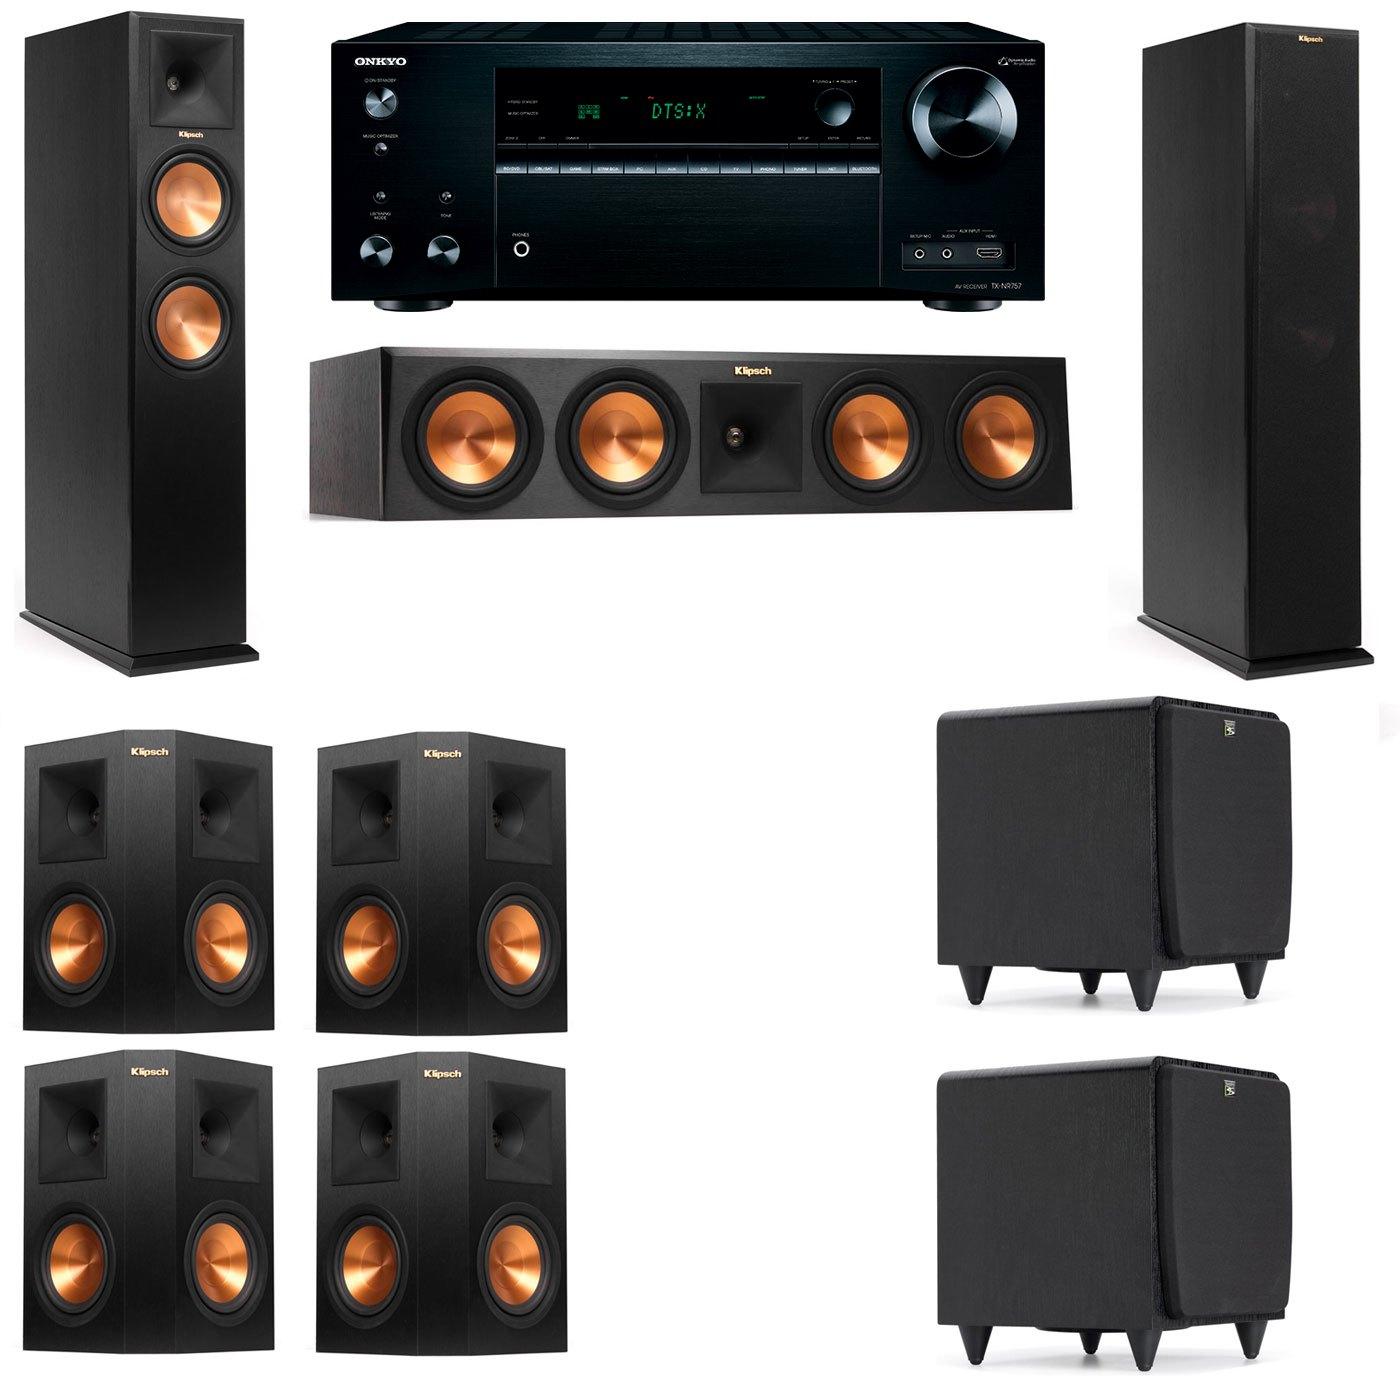 Klipsch RP-250F Tower Speakers-SDS12-7.2-Onkyo TX-NR757